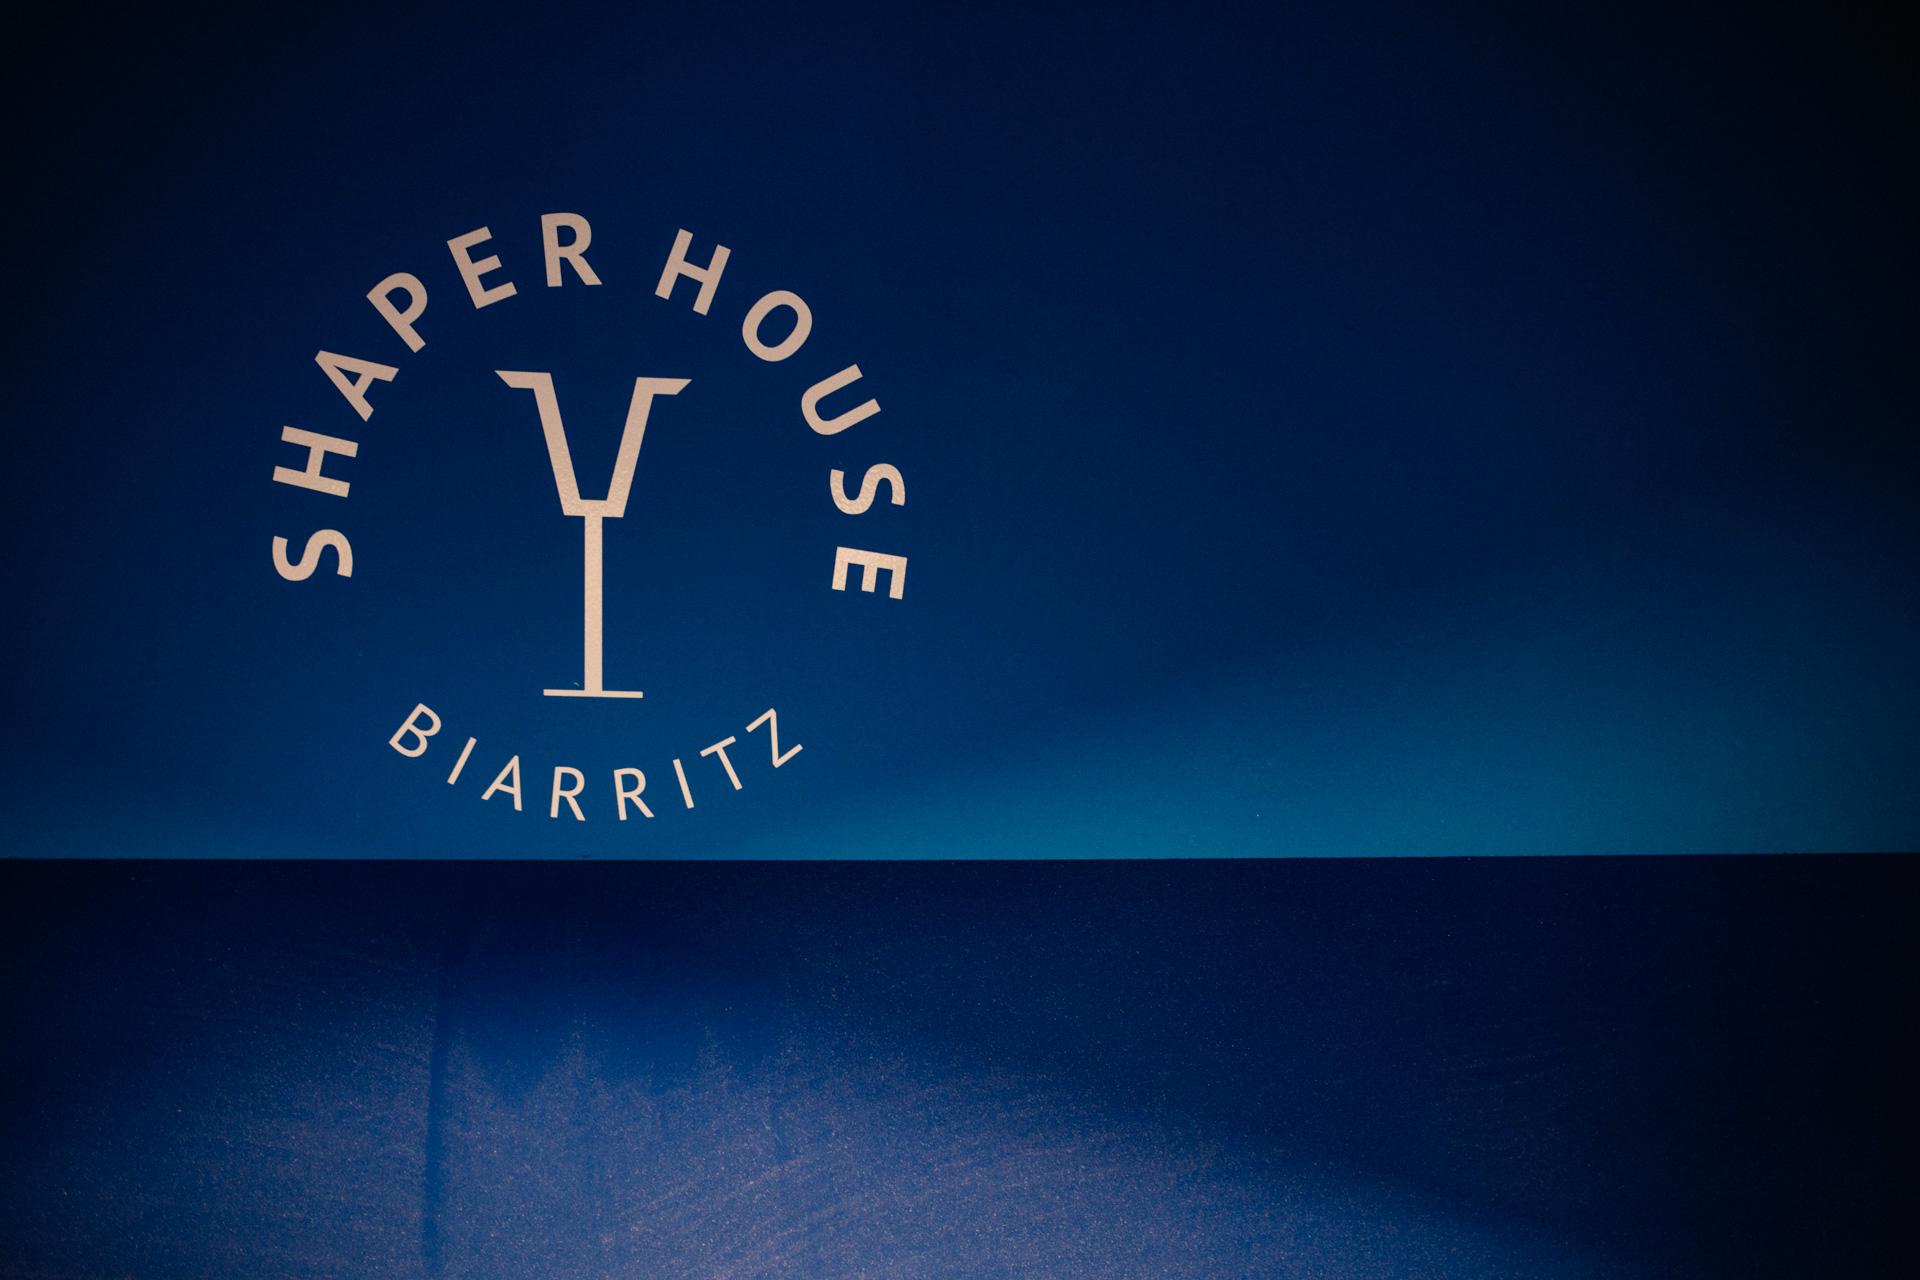 damien-dohmen-shaperhouse-15